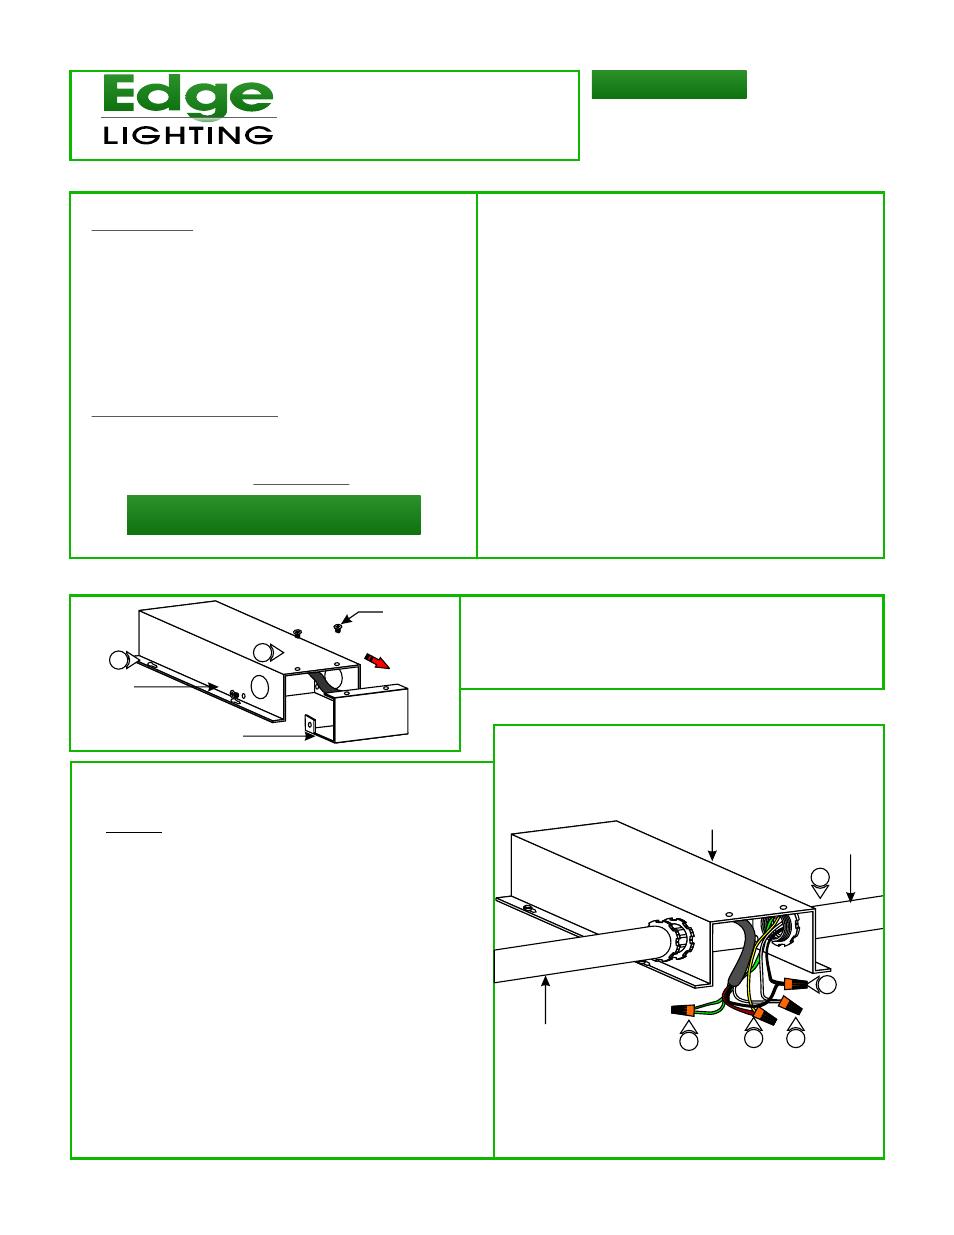 Edge Lighting PSB-60W-ELV-12VDC, 60 Watt 12 Volt DC Power Supply User  Manual | 2 pages